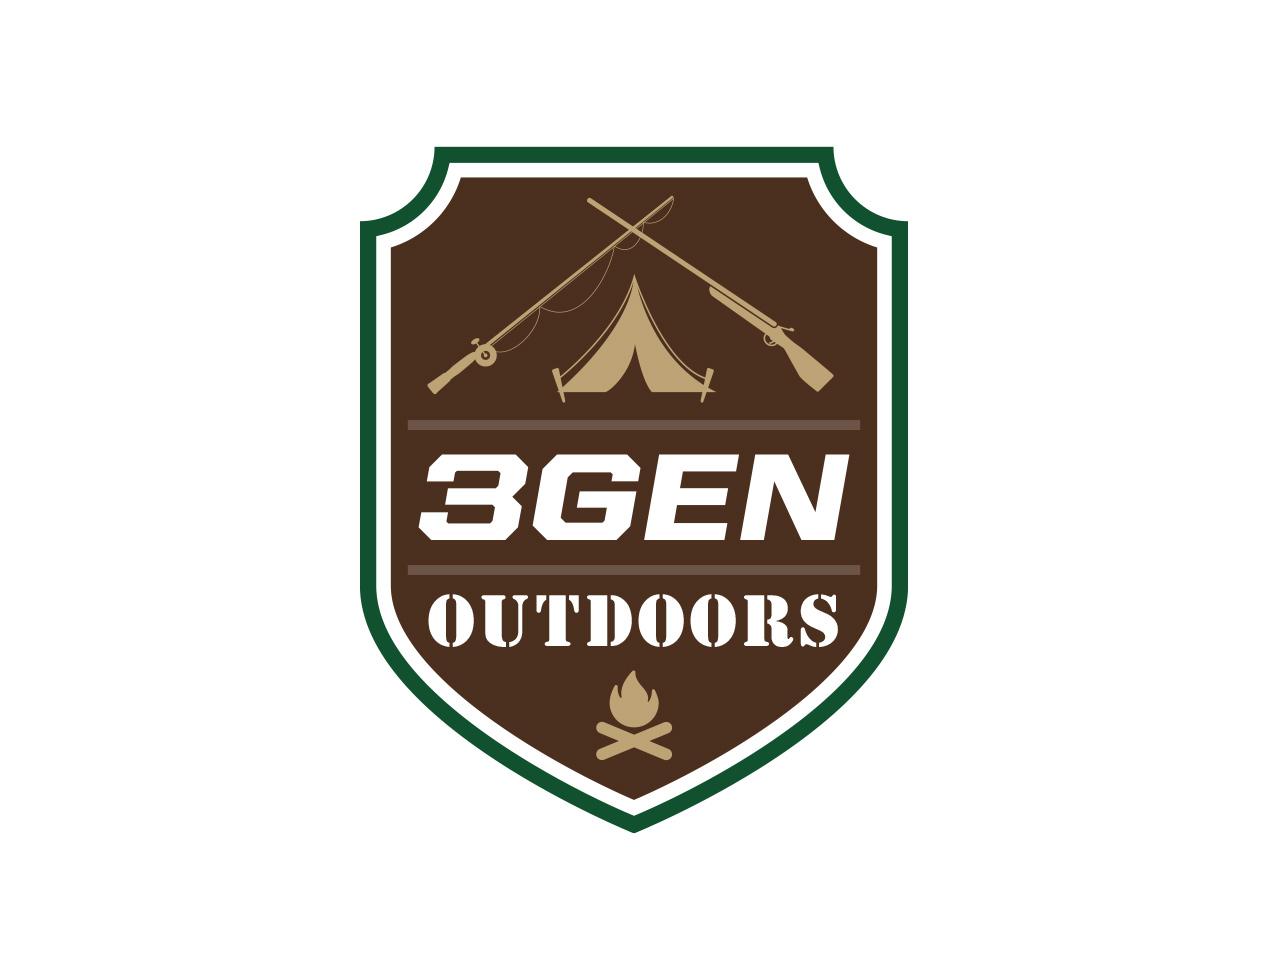 3GEN-outdoors.jpg